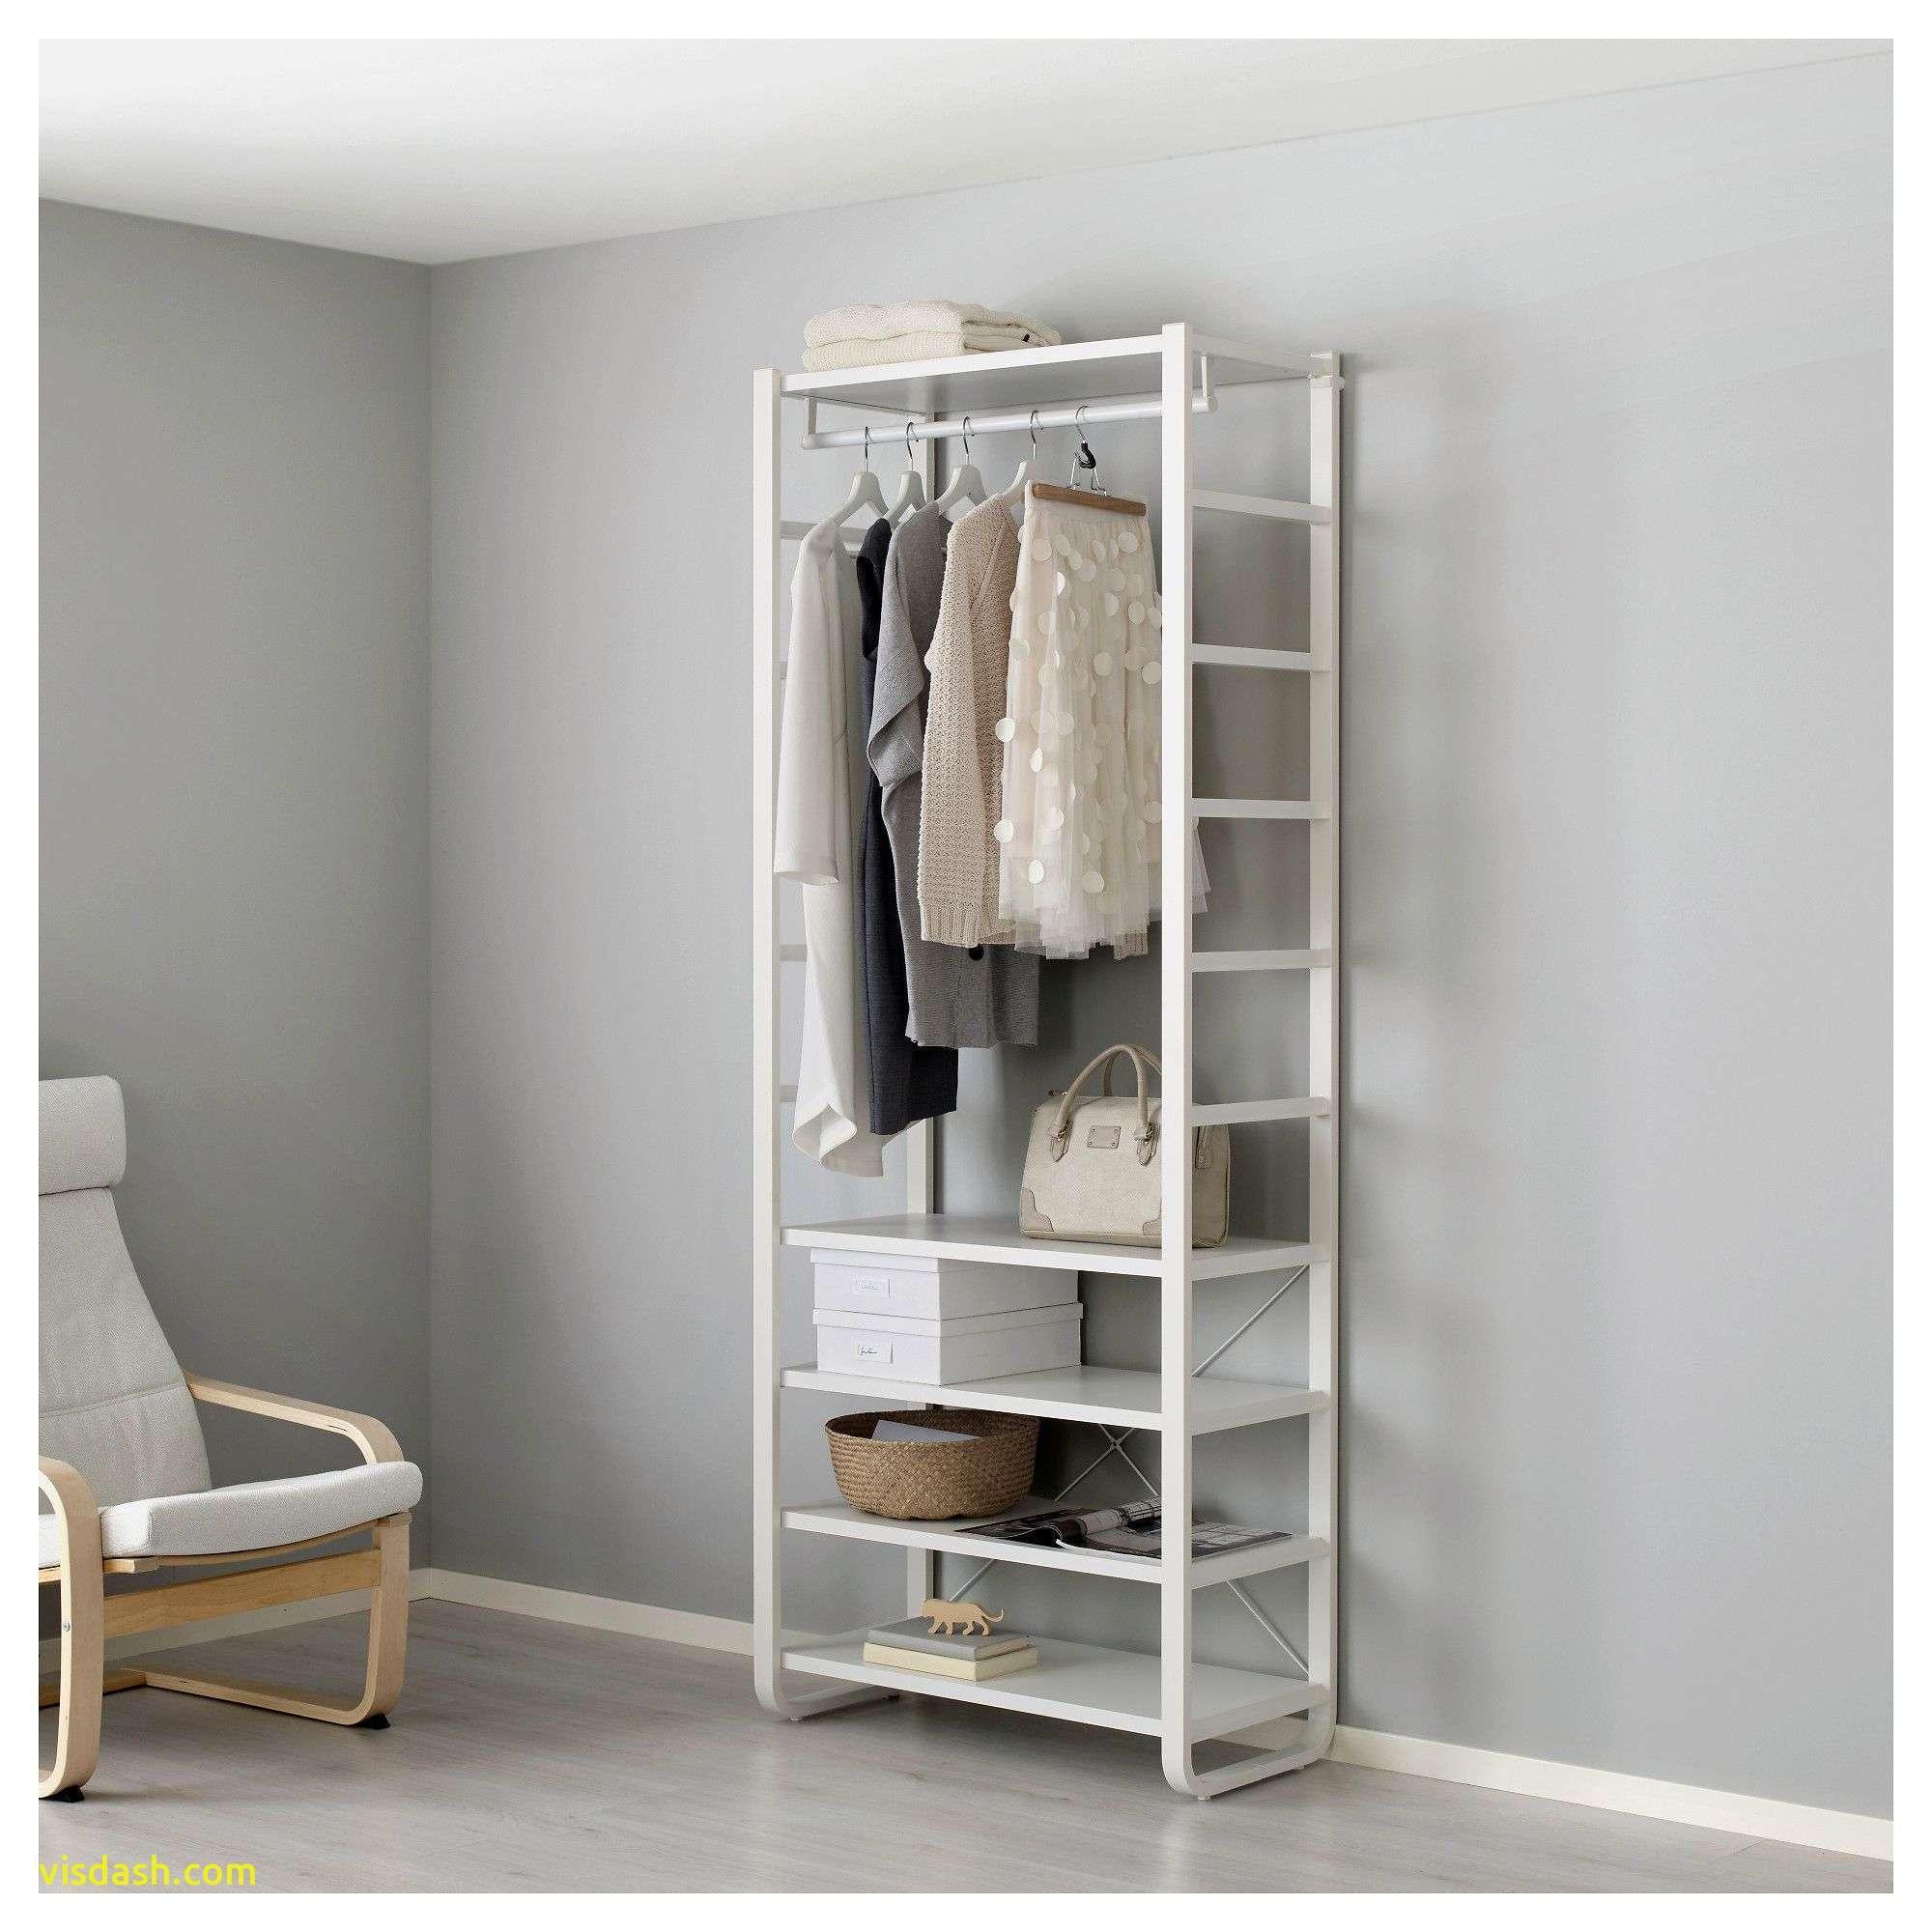 wardrobe interiors ikea elvarli 1 section white 84x40x216 cm you can always adapt JXUJYRZ